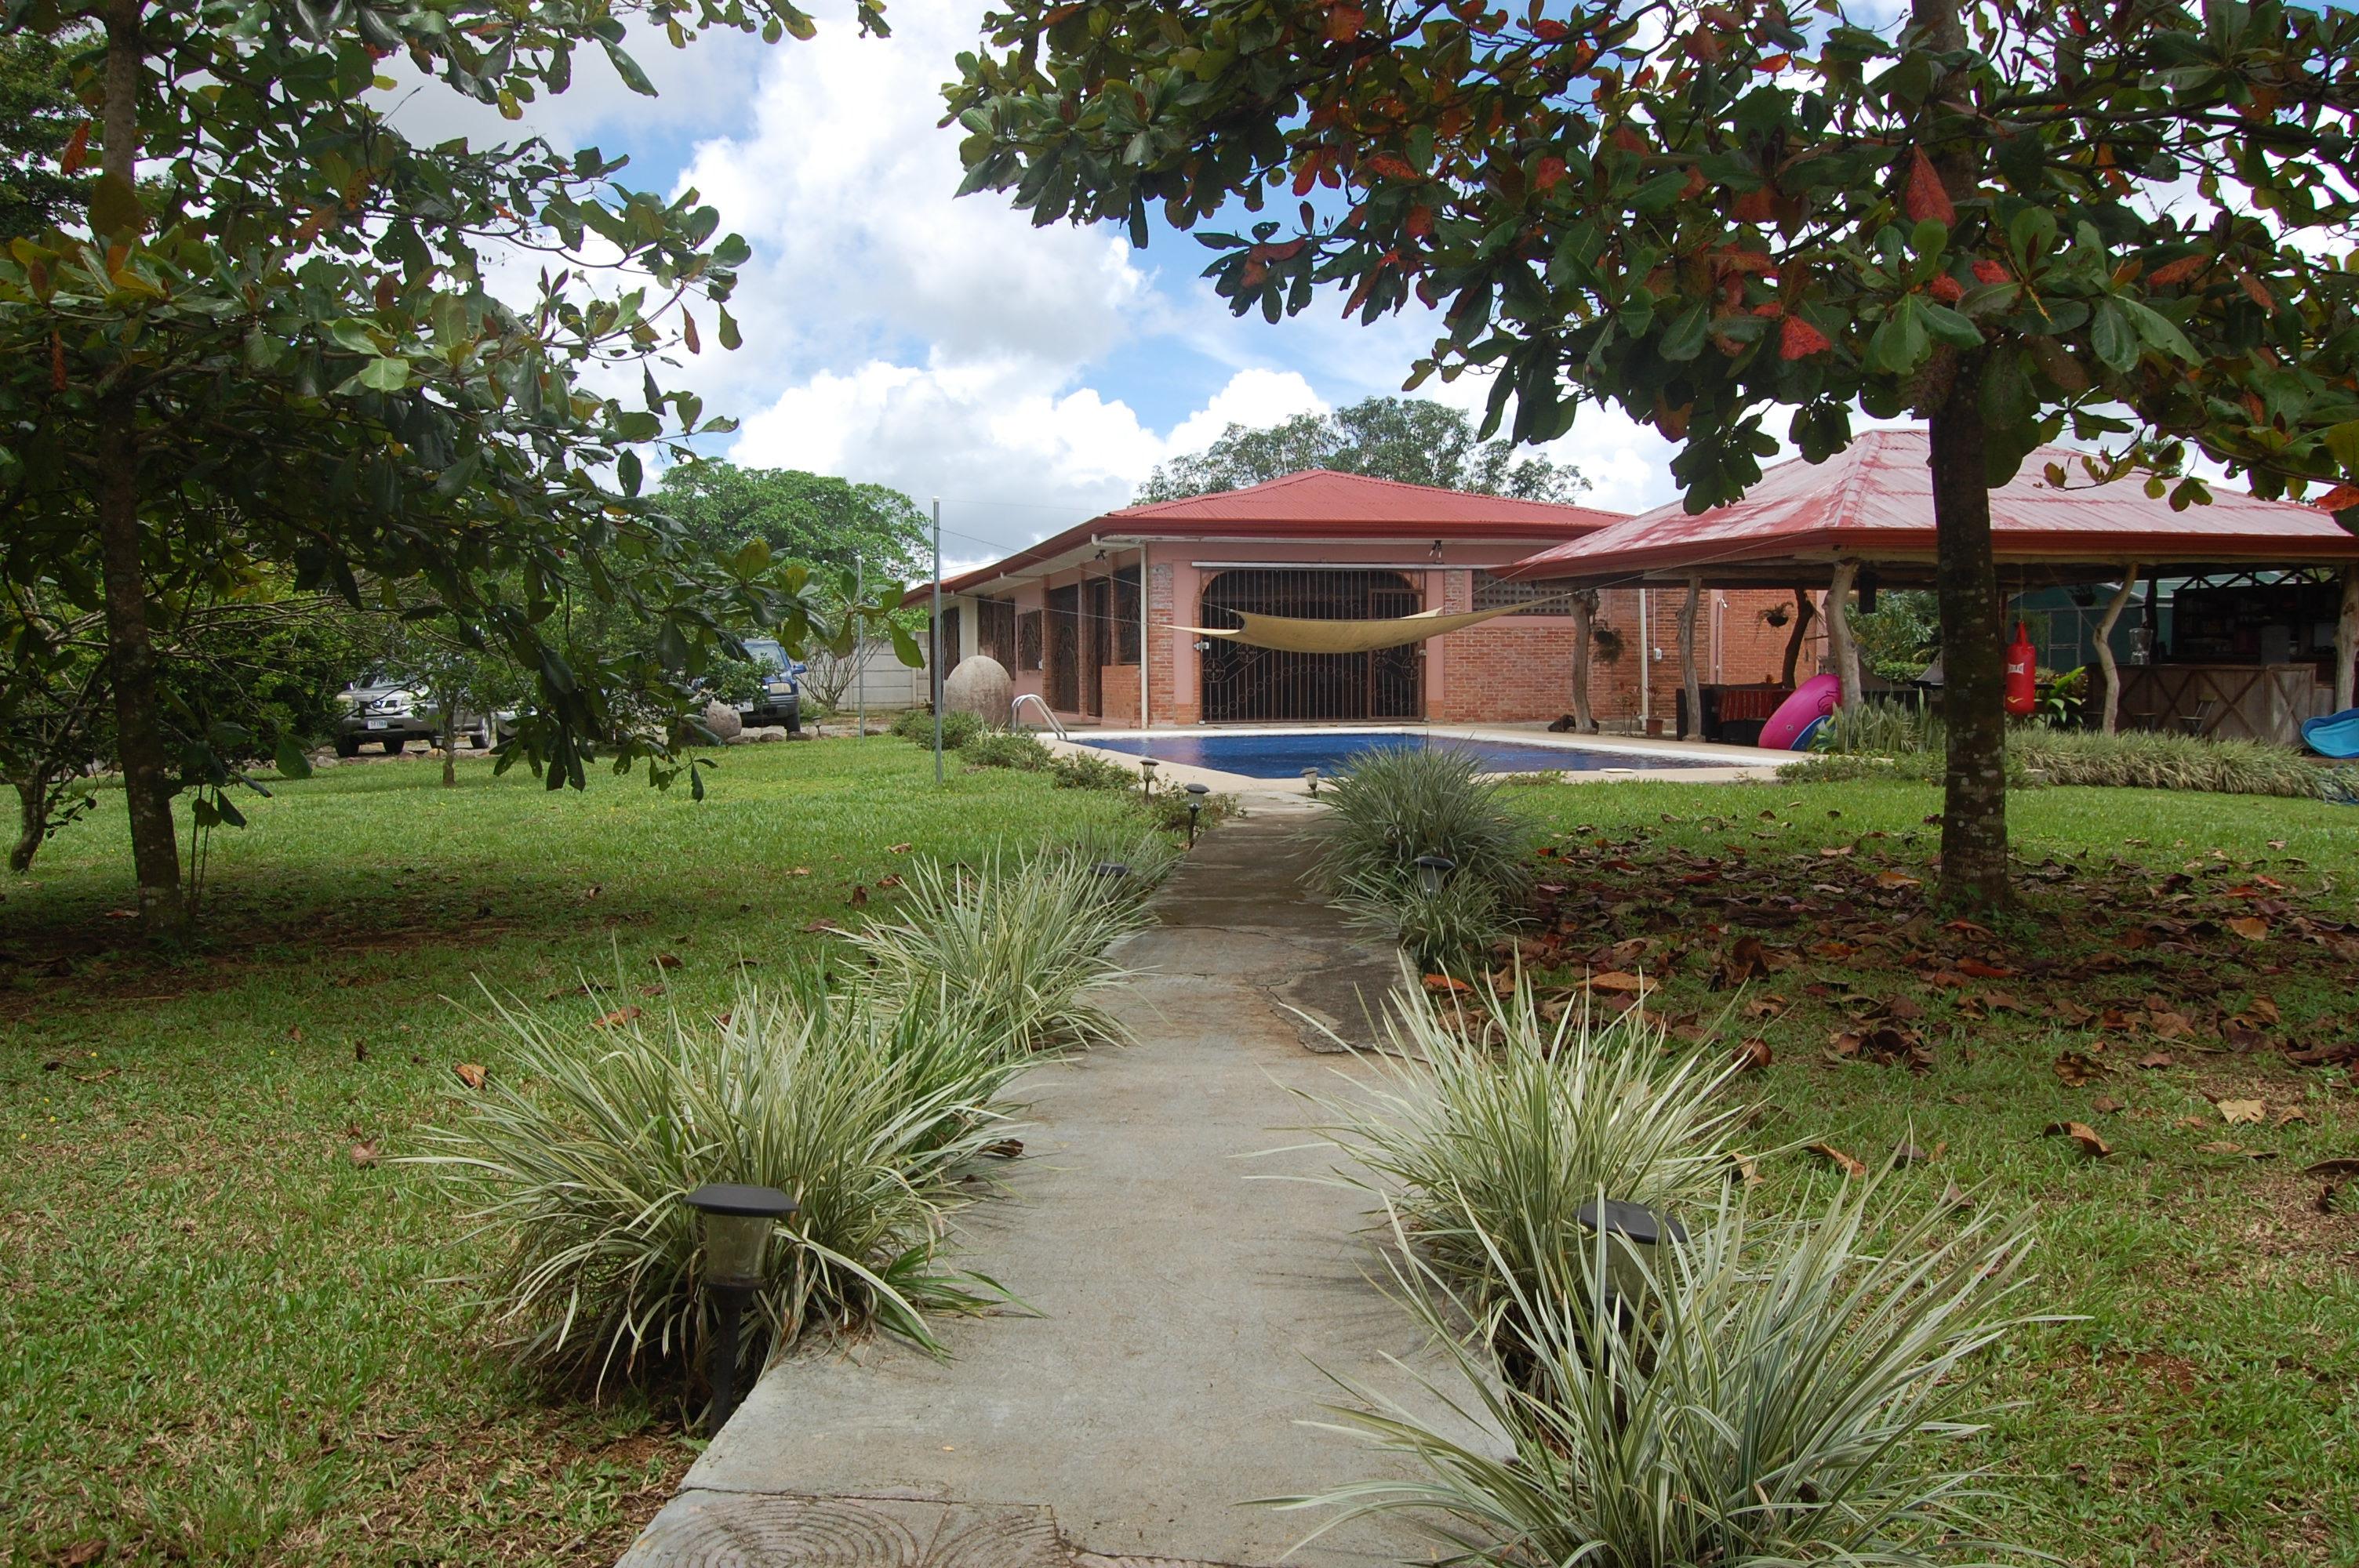 San-Isidro-Costa-Rica-property-costaricarealestateSI038-1.jpg